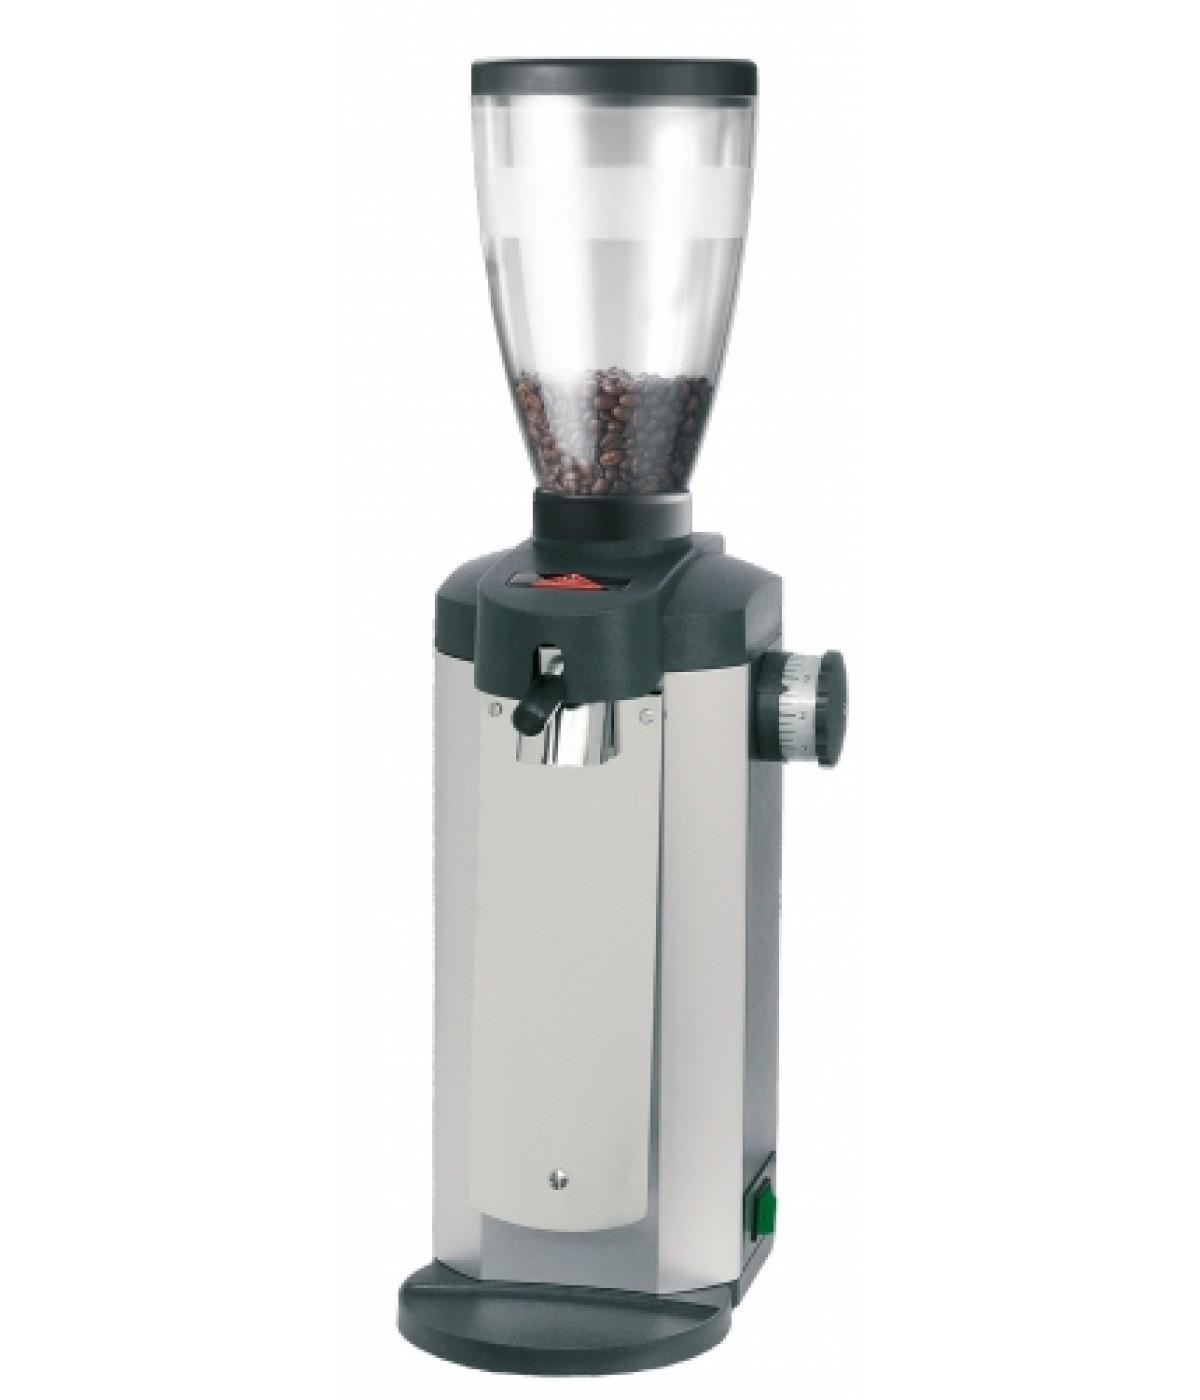 Professional coffee grinder Mahlkoenig Tanzania